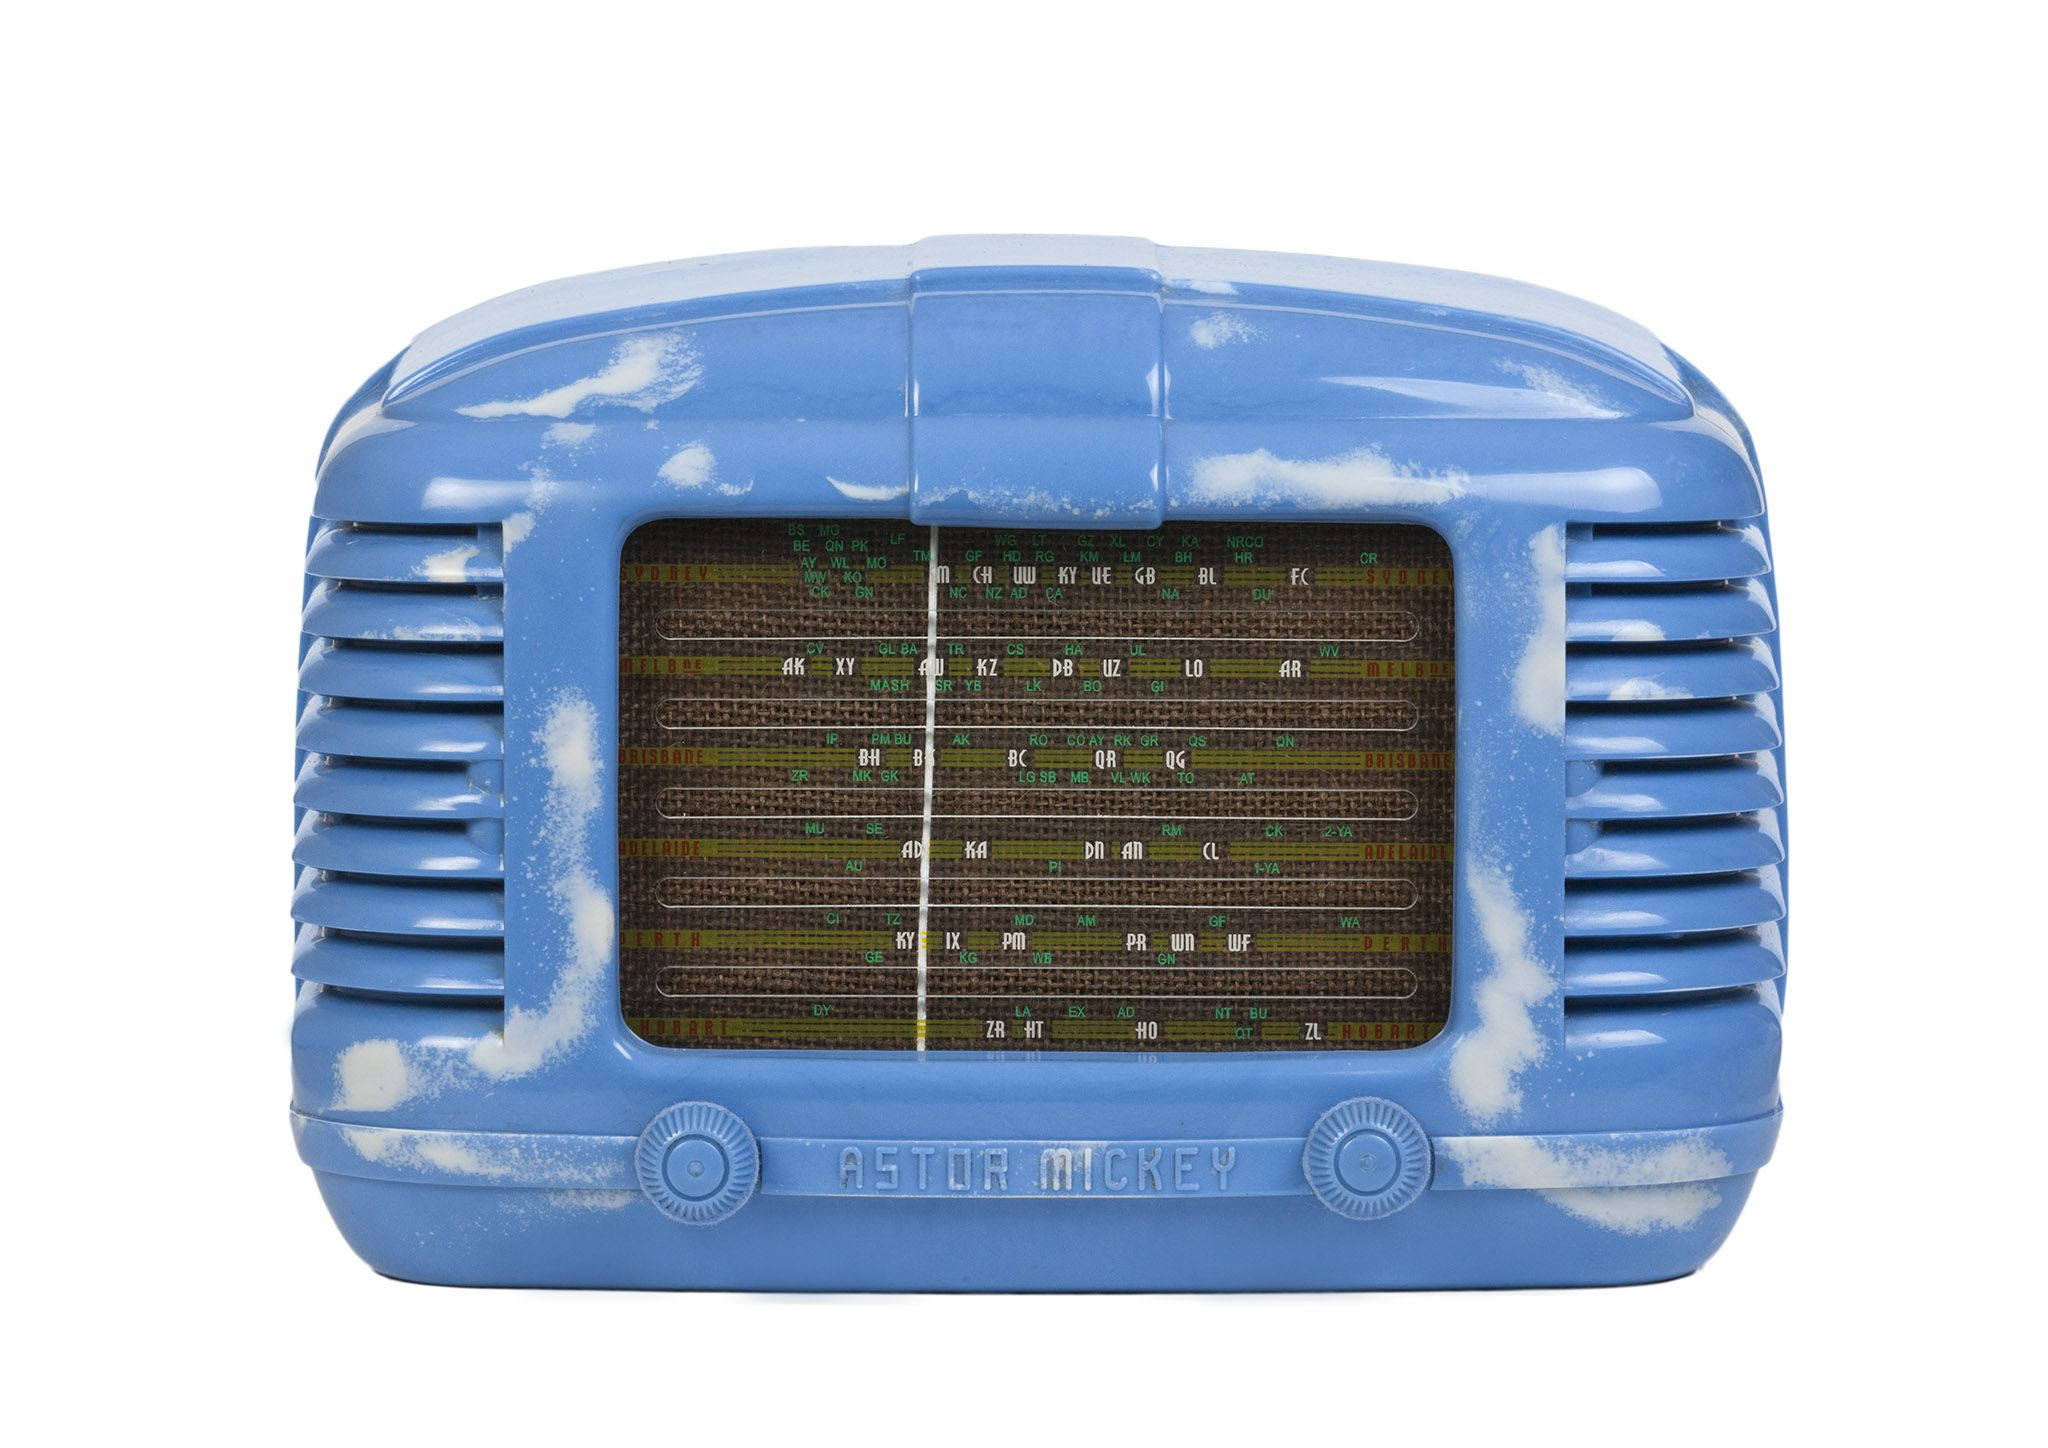 1946 Astor Mickey KL Radio (Australia)   Old Tube Radios in